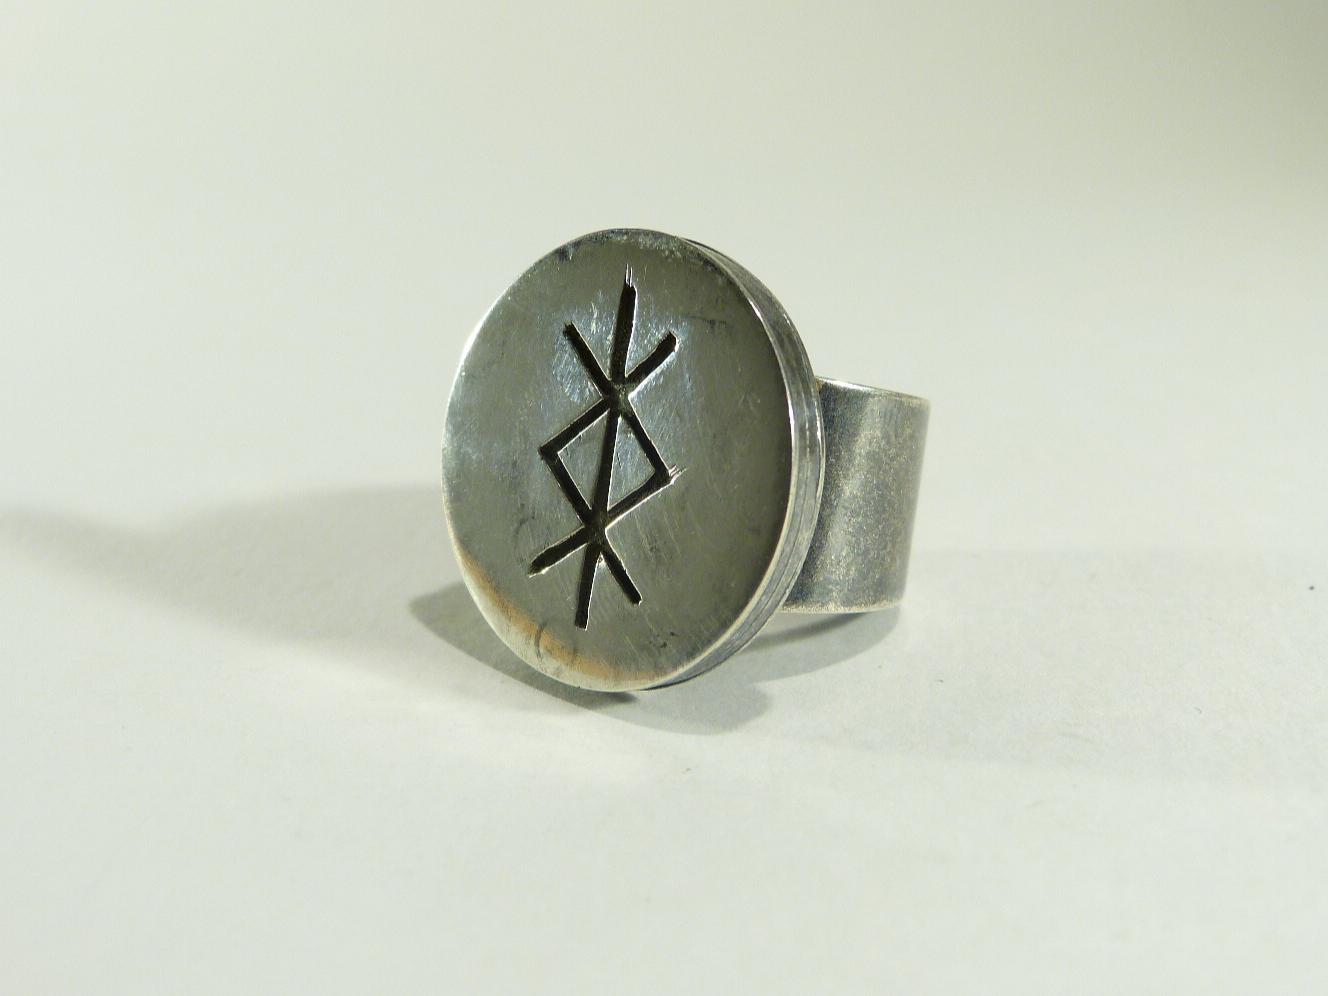 Rune protection